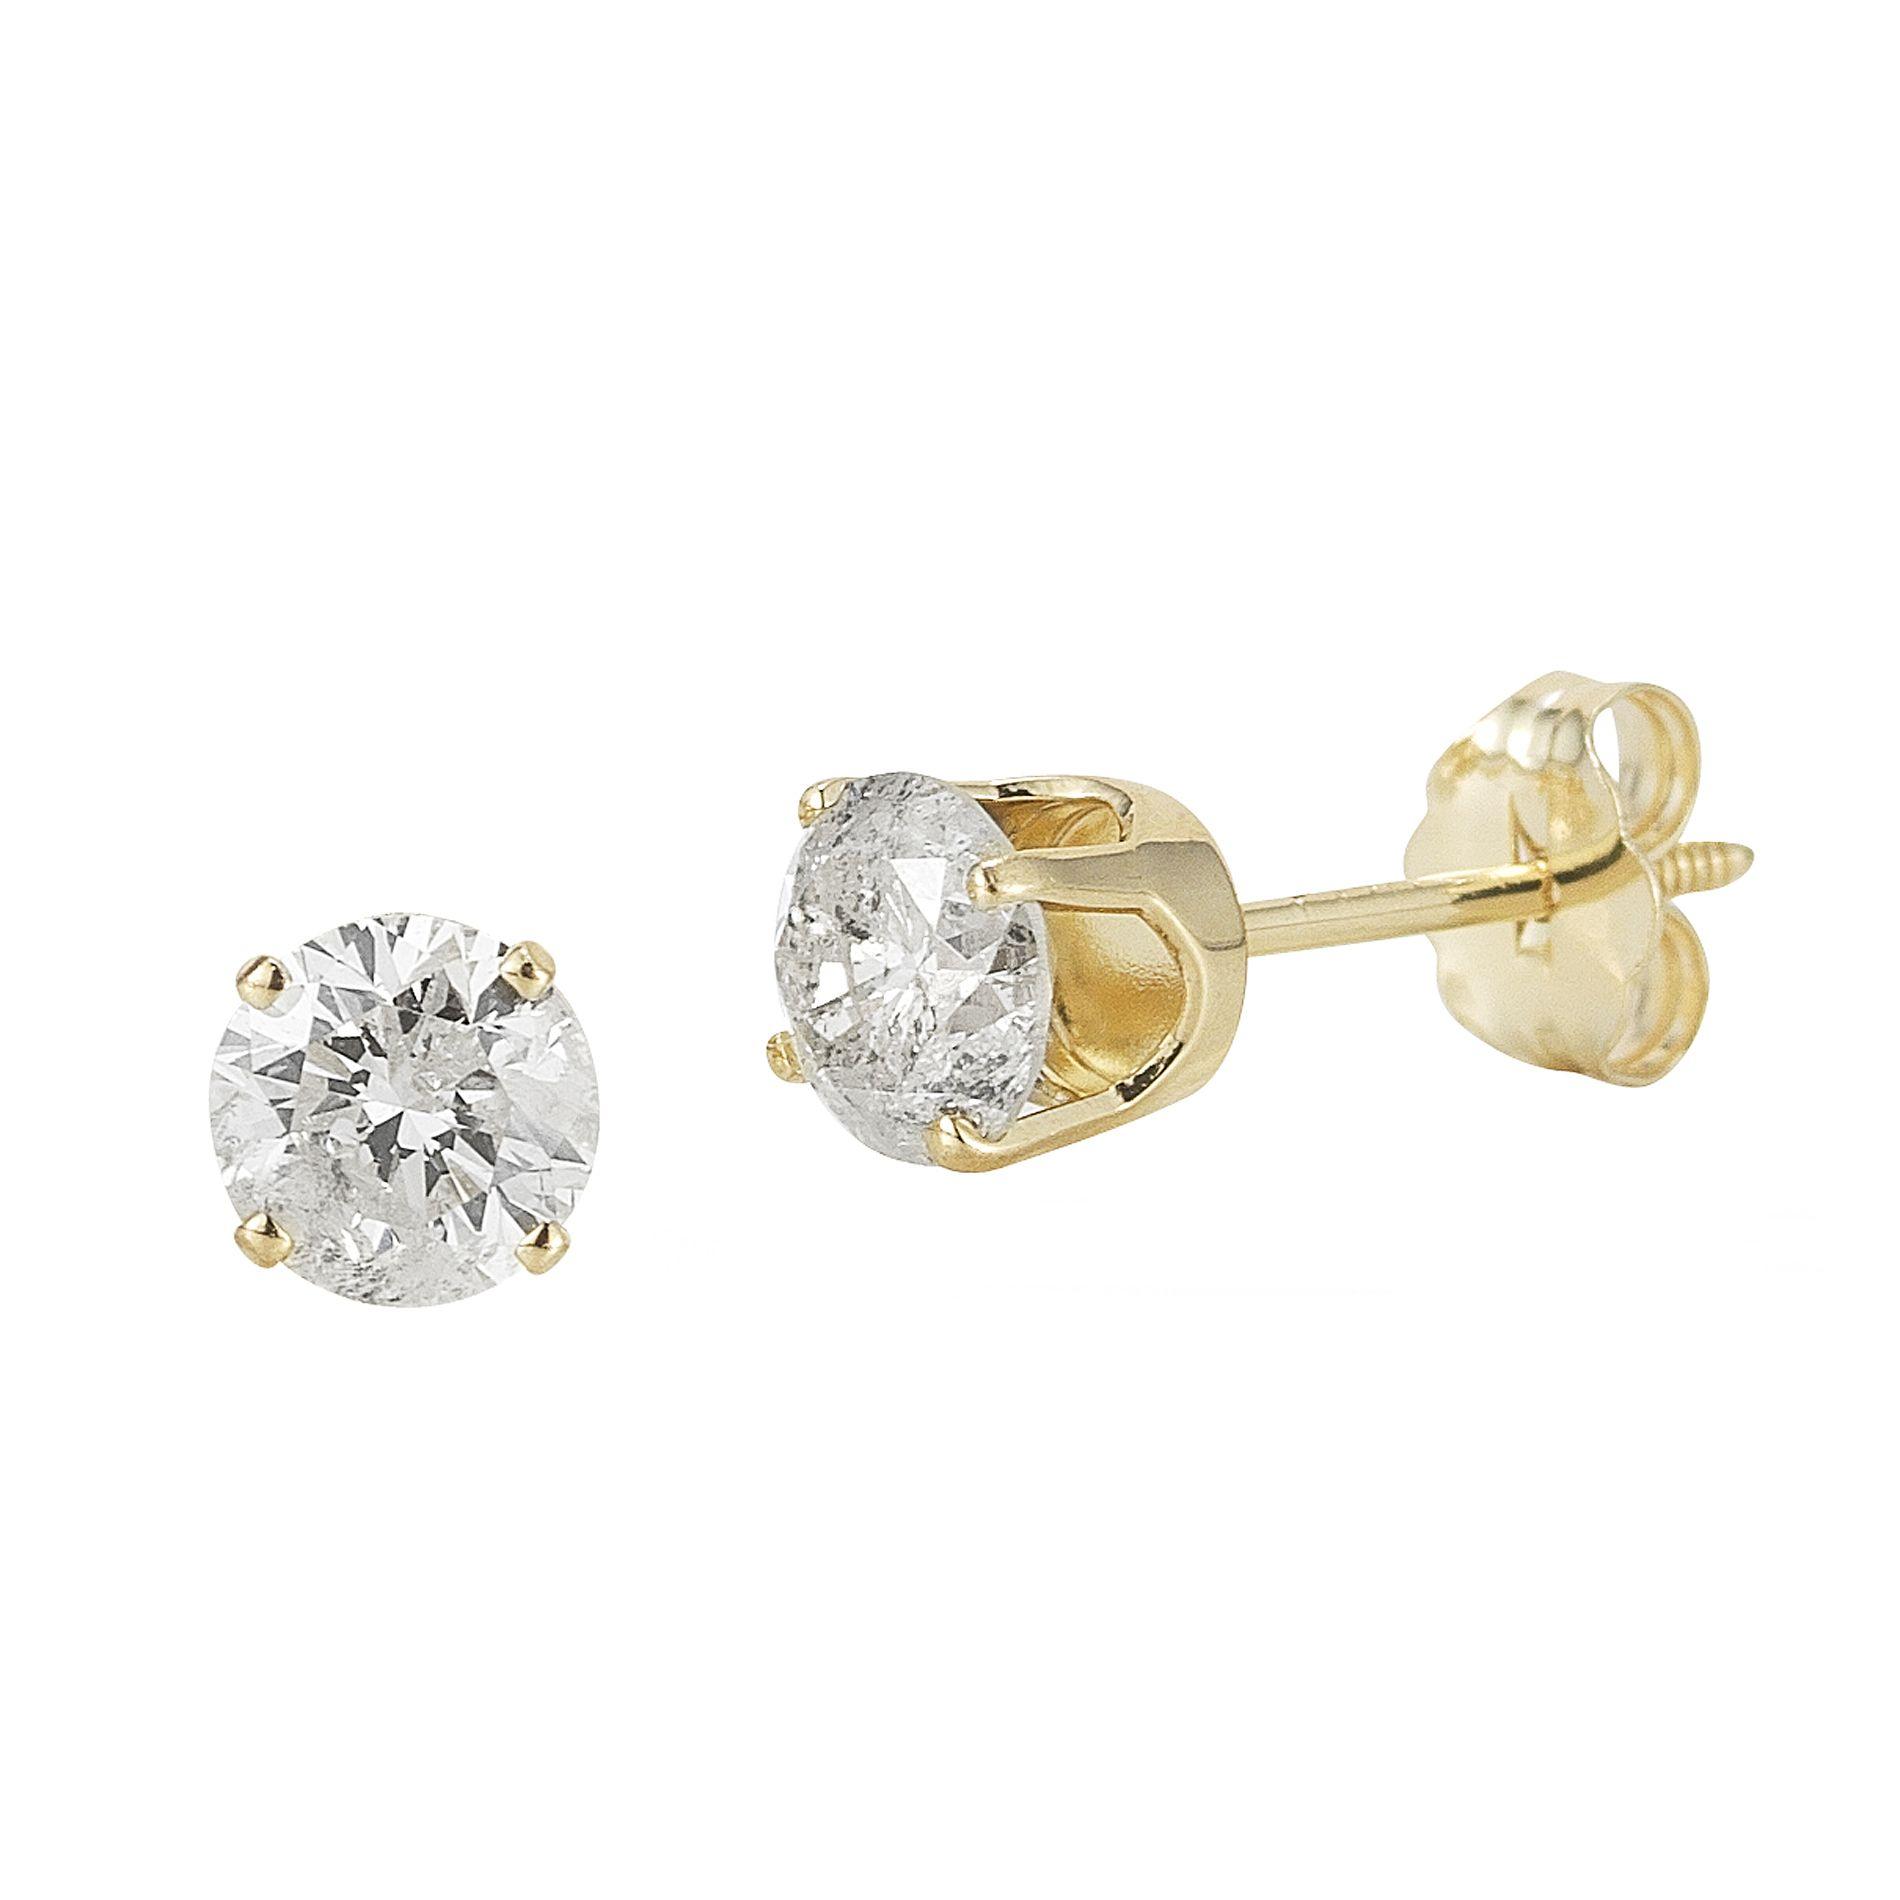 14Kt Yellow Gold Genuine 1.00Cttw Diamond